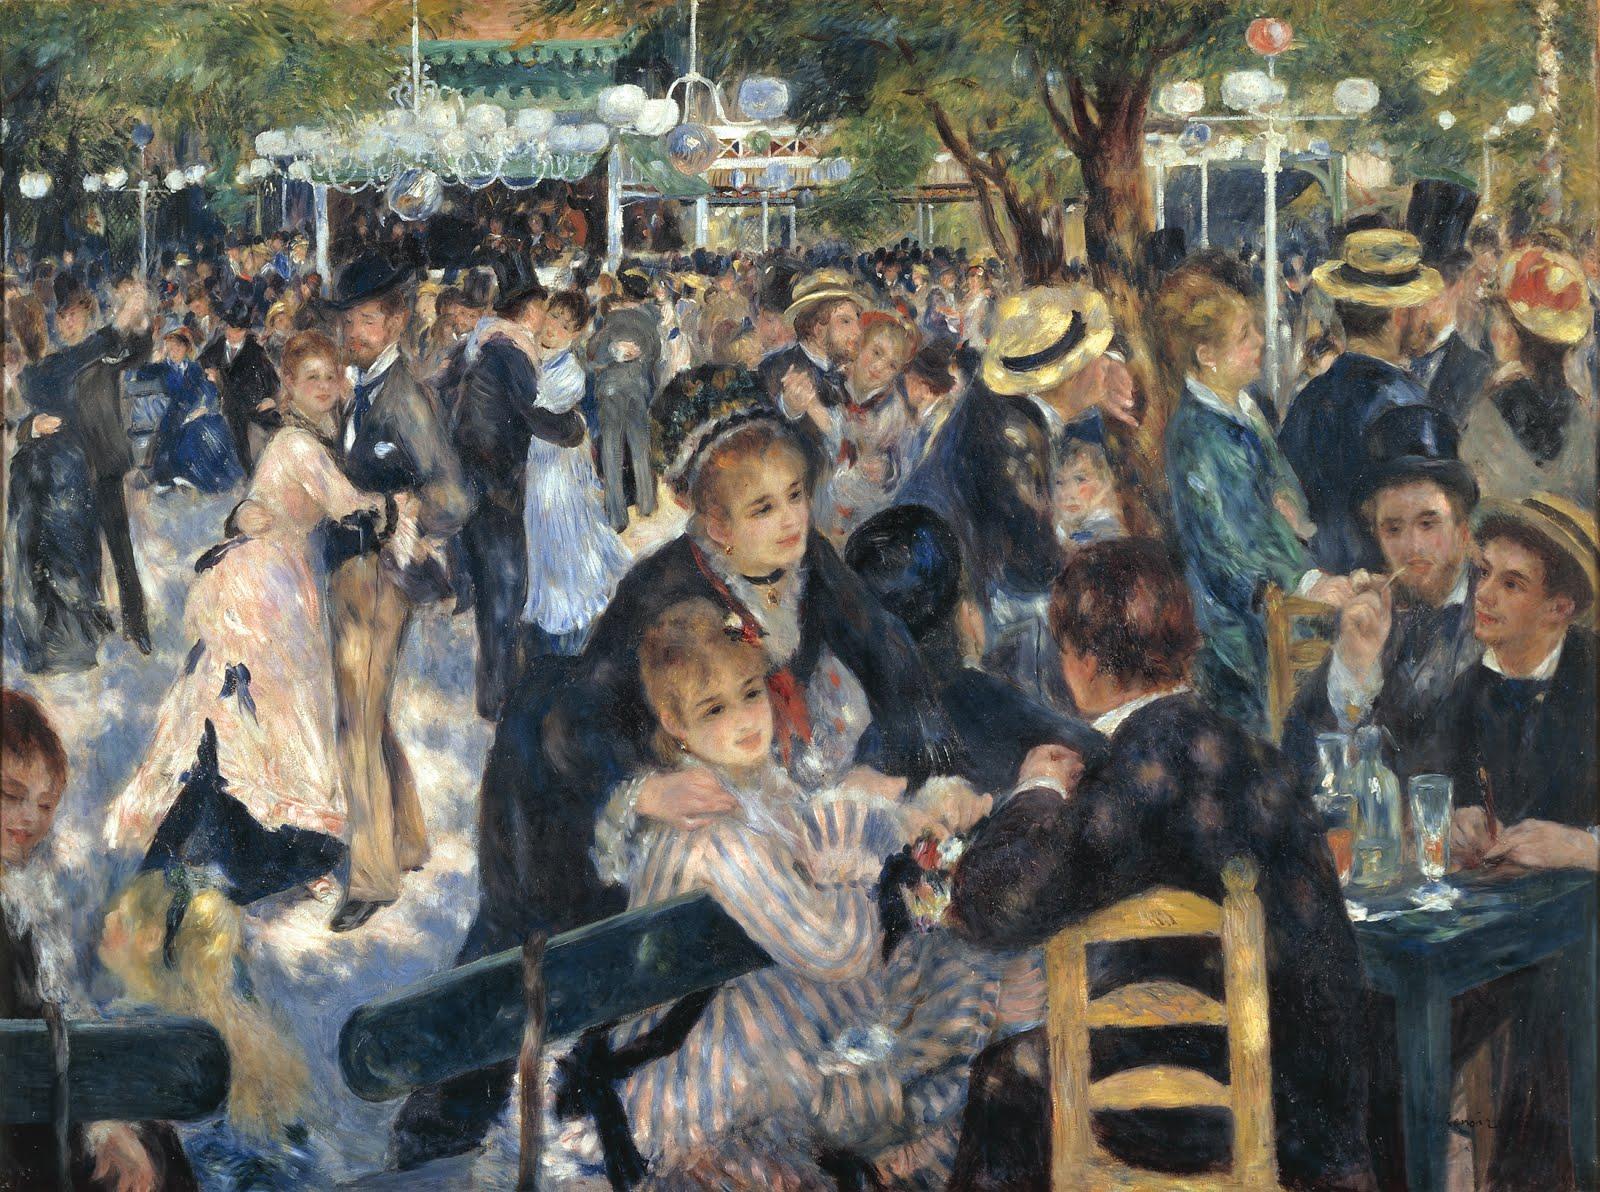 Pierre-Auguste Renoir - Baile do Moinho da Galette